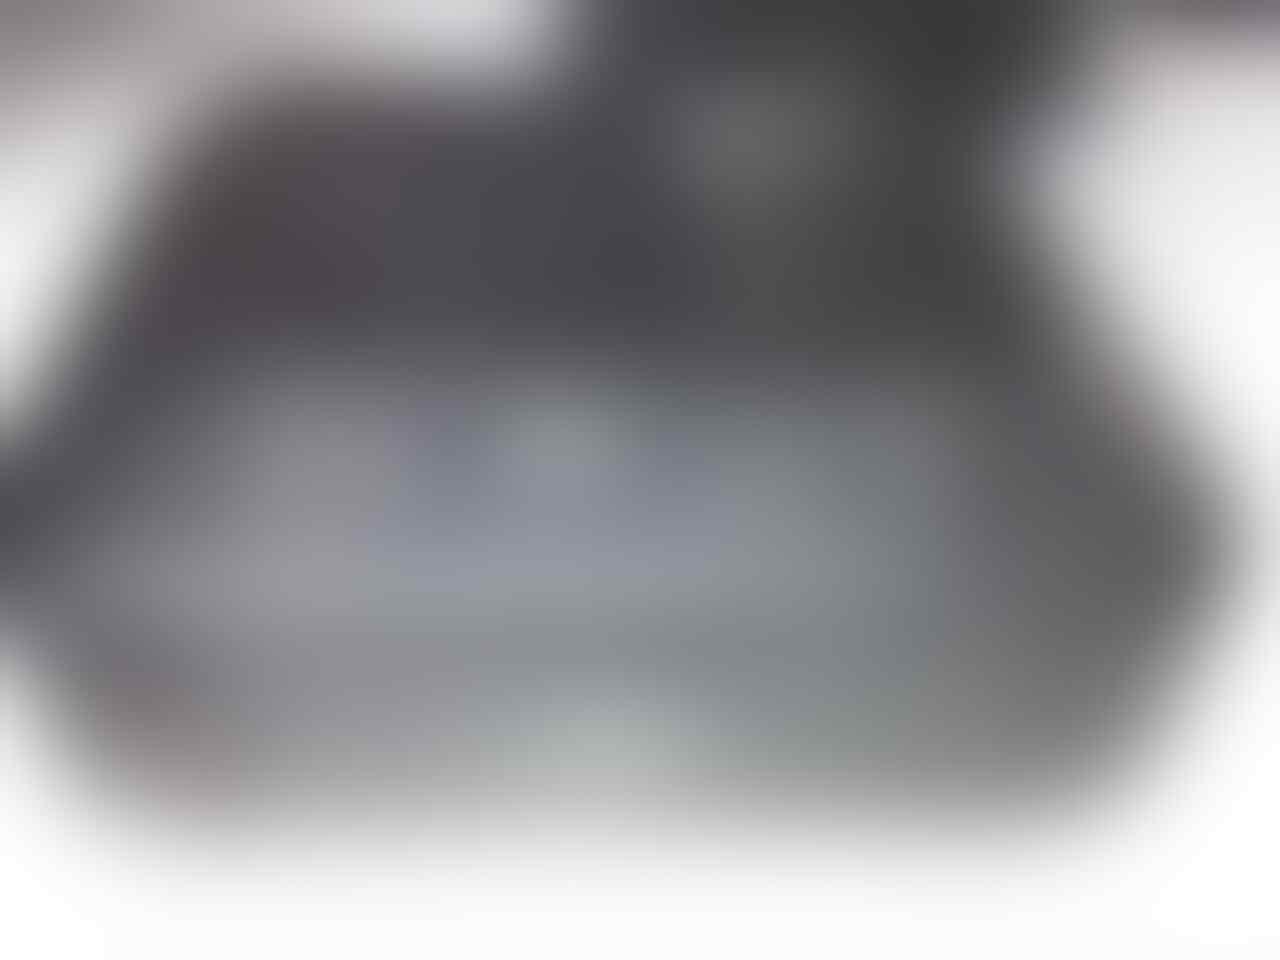 SALE PRINTER CANON MX377 second bandung